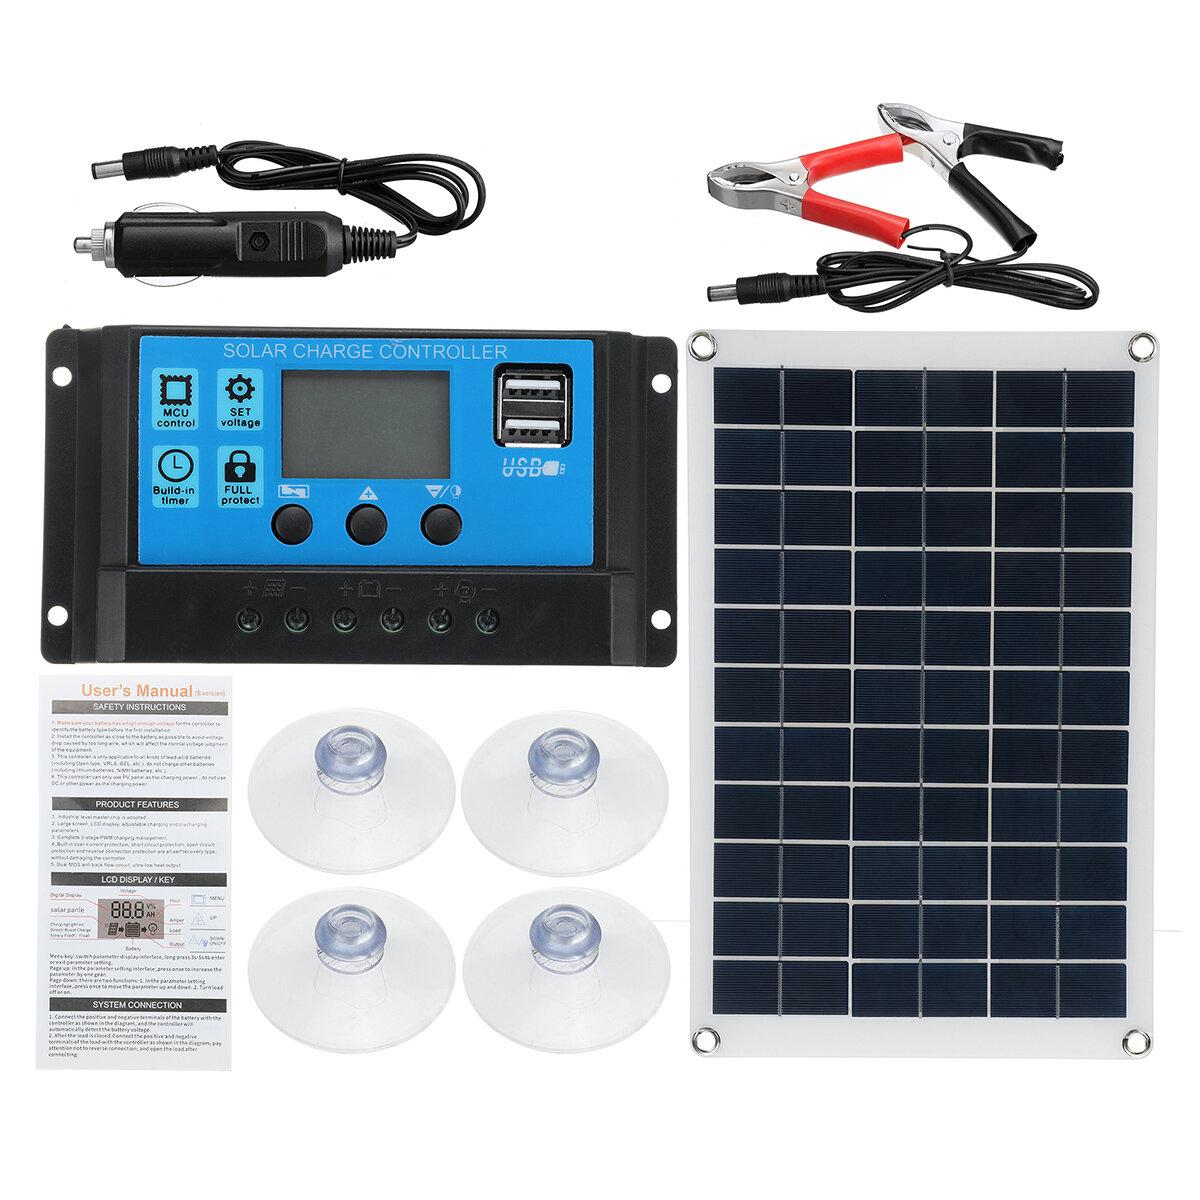 Banggood coupon: Kit de painel solar 100 W 12V Bateria Carregador 10-100A LCD Controlador para barco com van de caravana